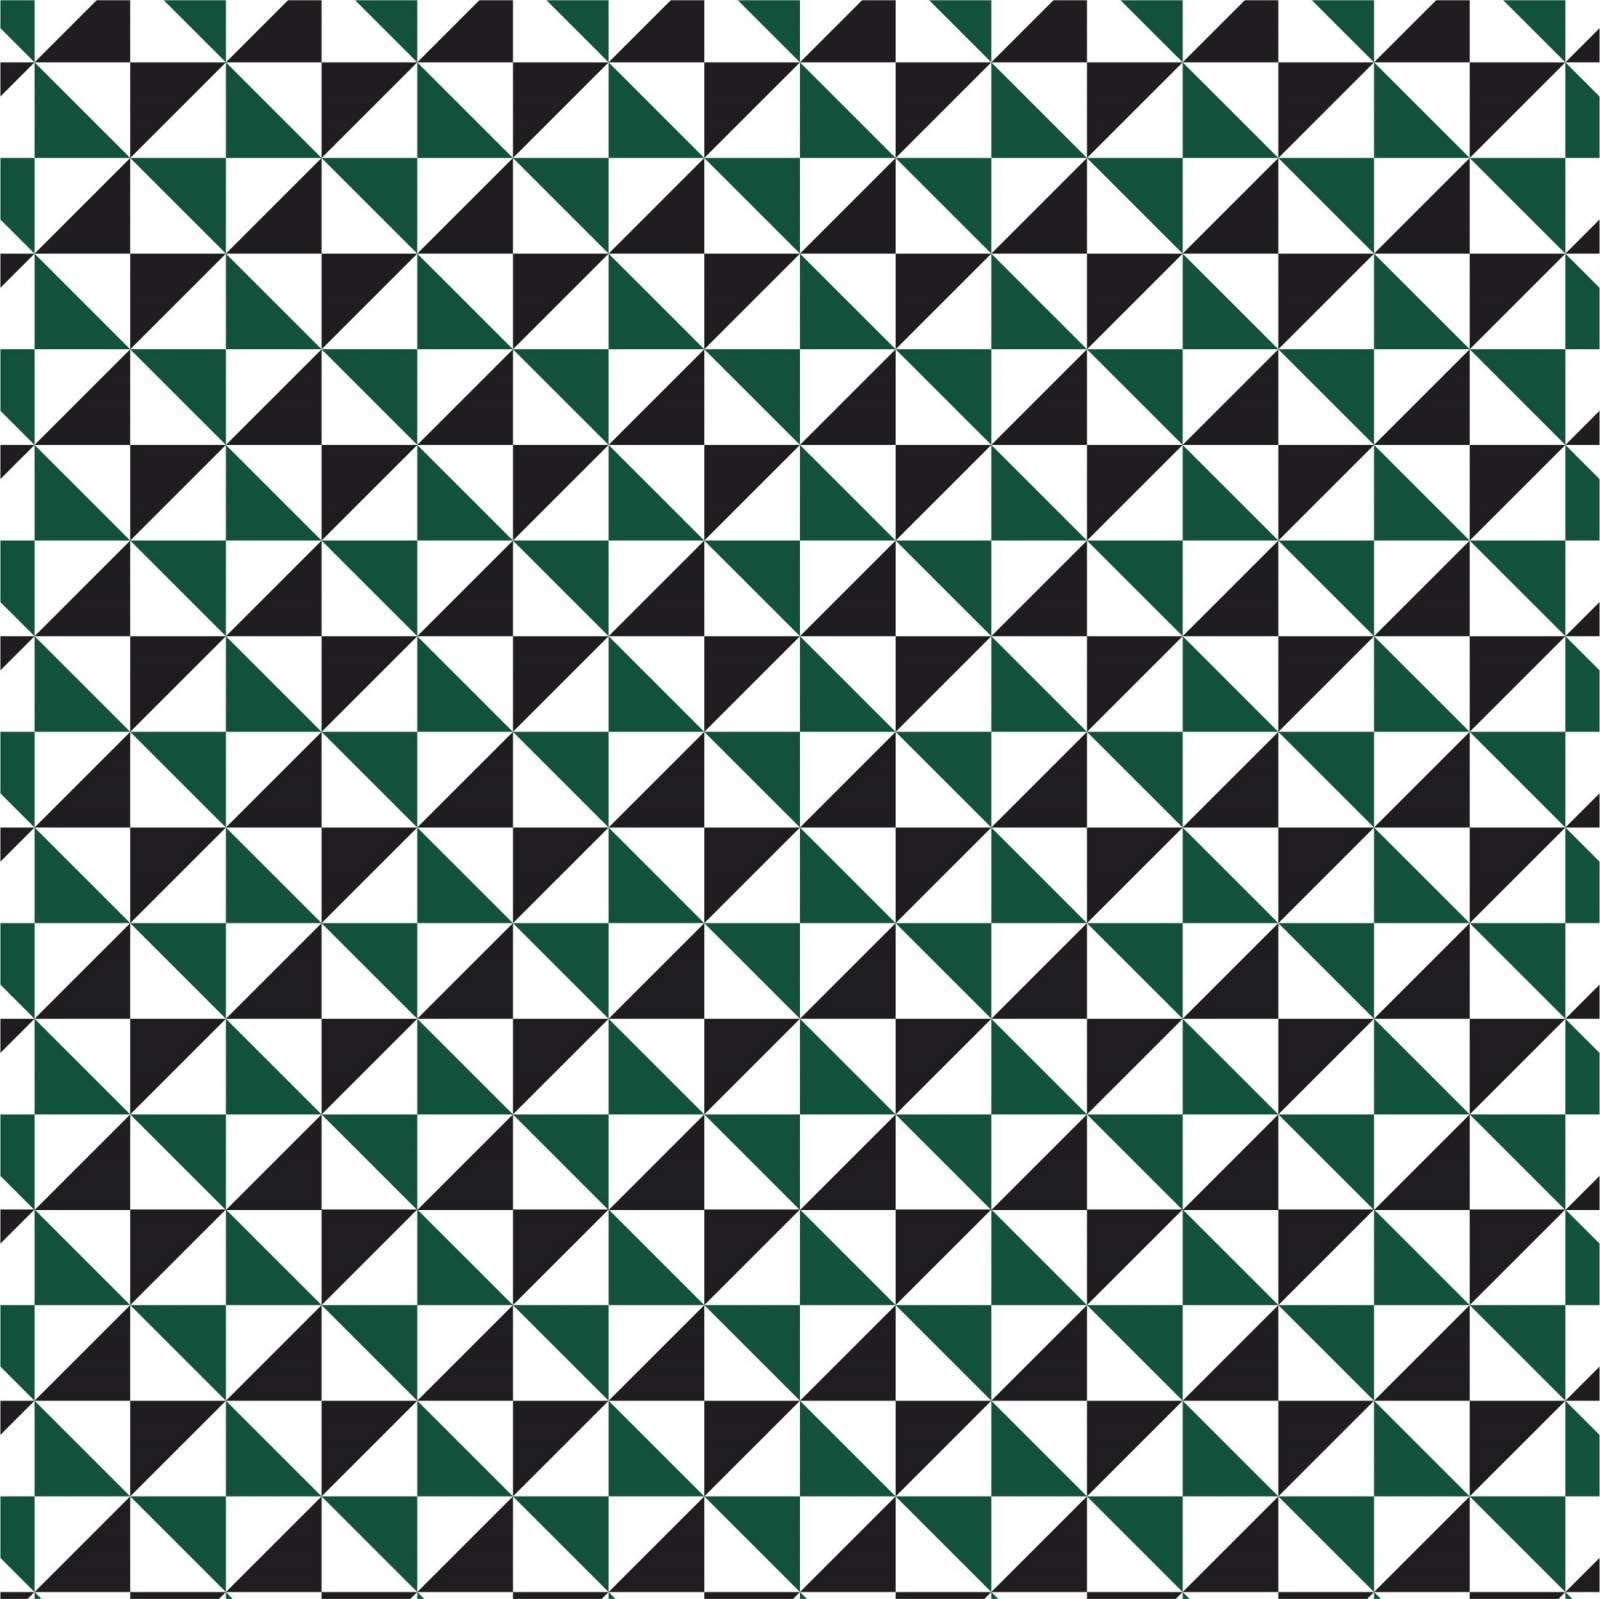 Papel de Parede Triangulo Verde | Adesivo Vinilico imagem 1